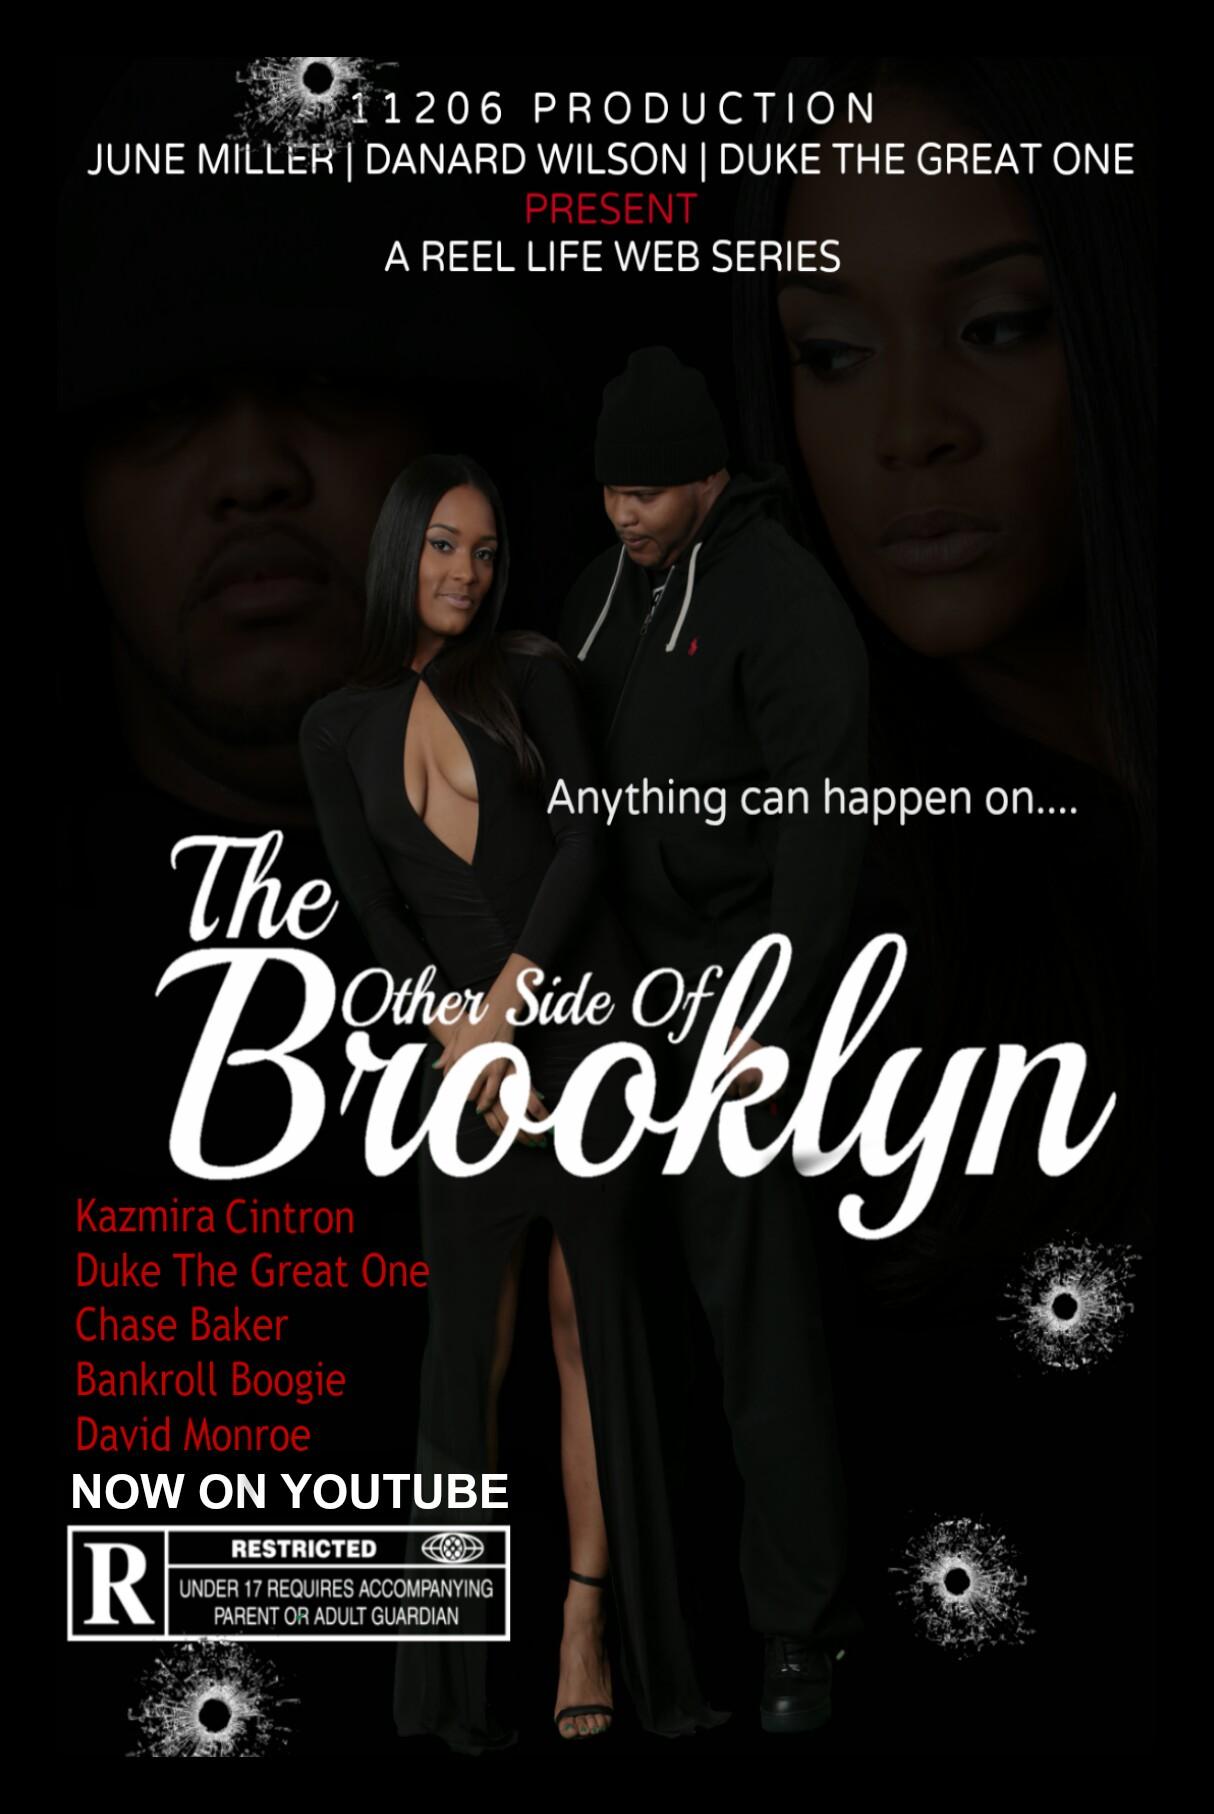 BROOKLYN, NEW YORK  WEB SERIES